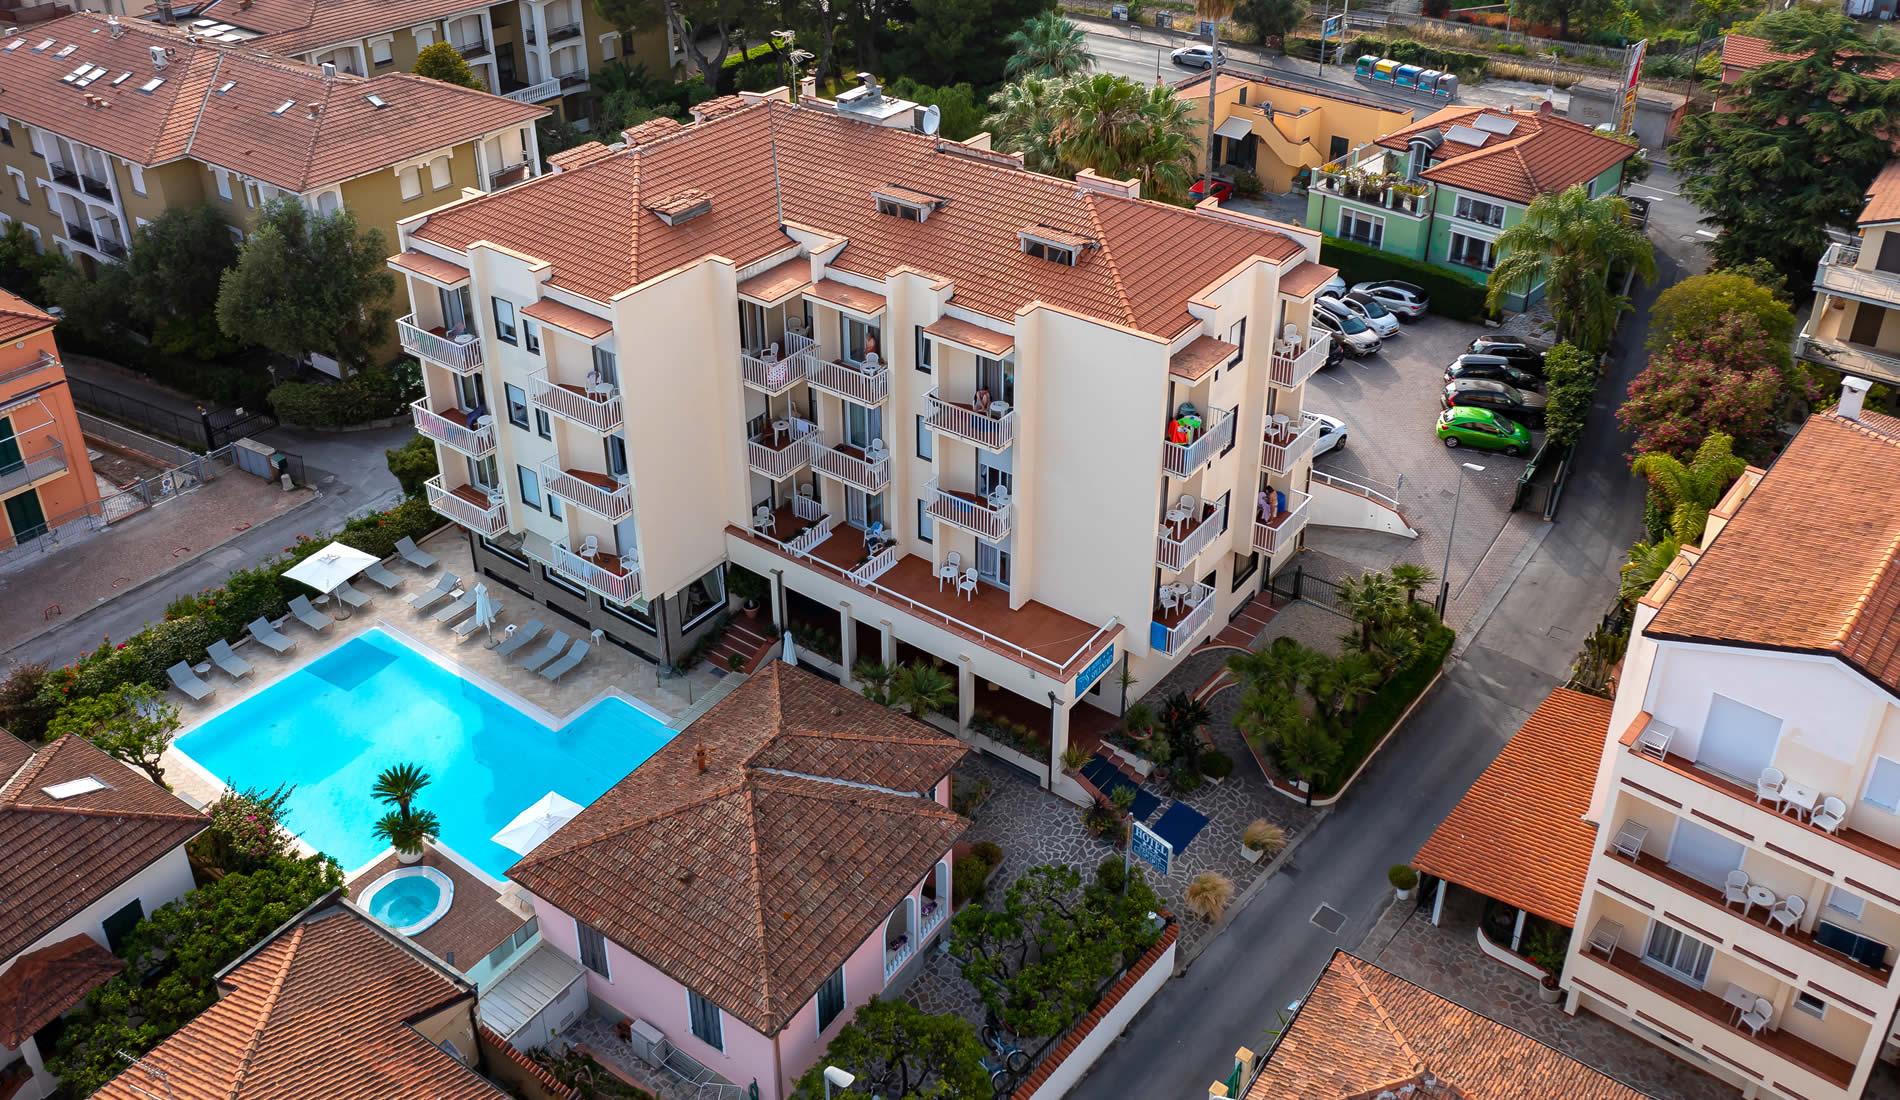 Hotel Splendid Diano Marina Prezzi